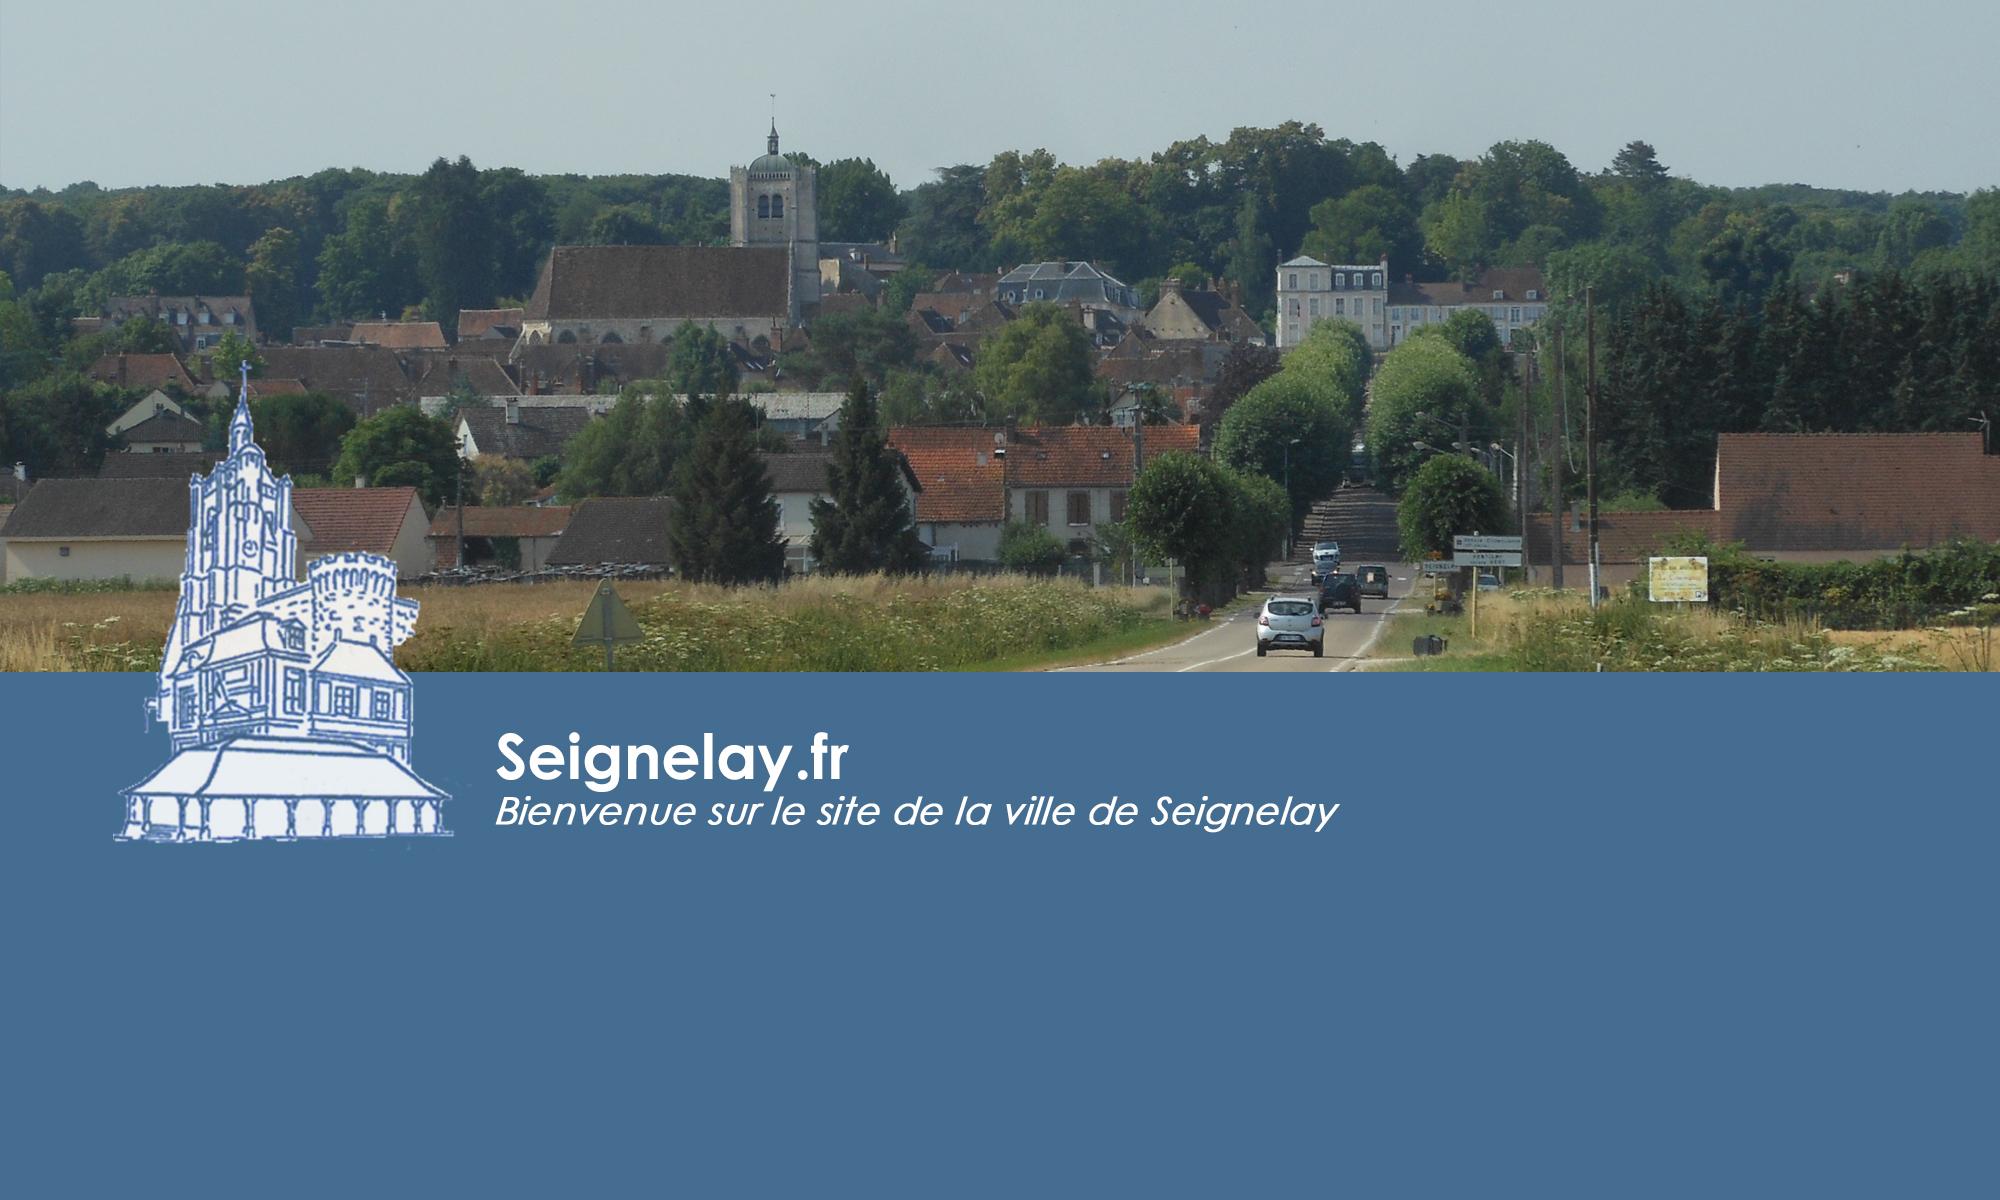 Seignelay